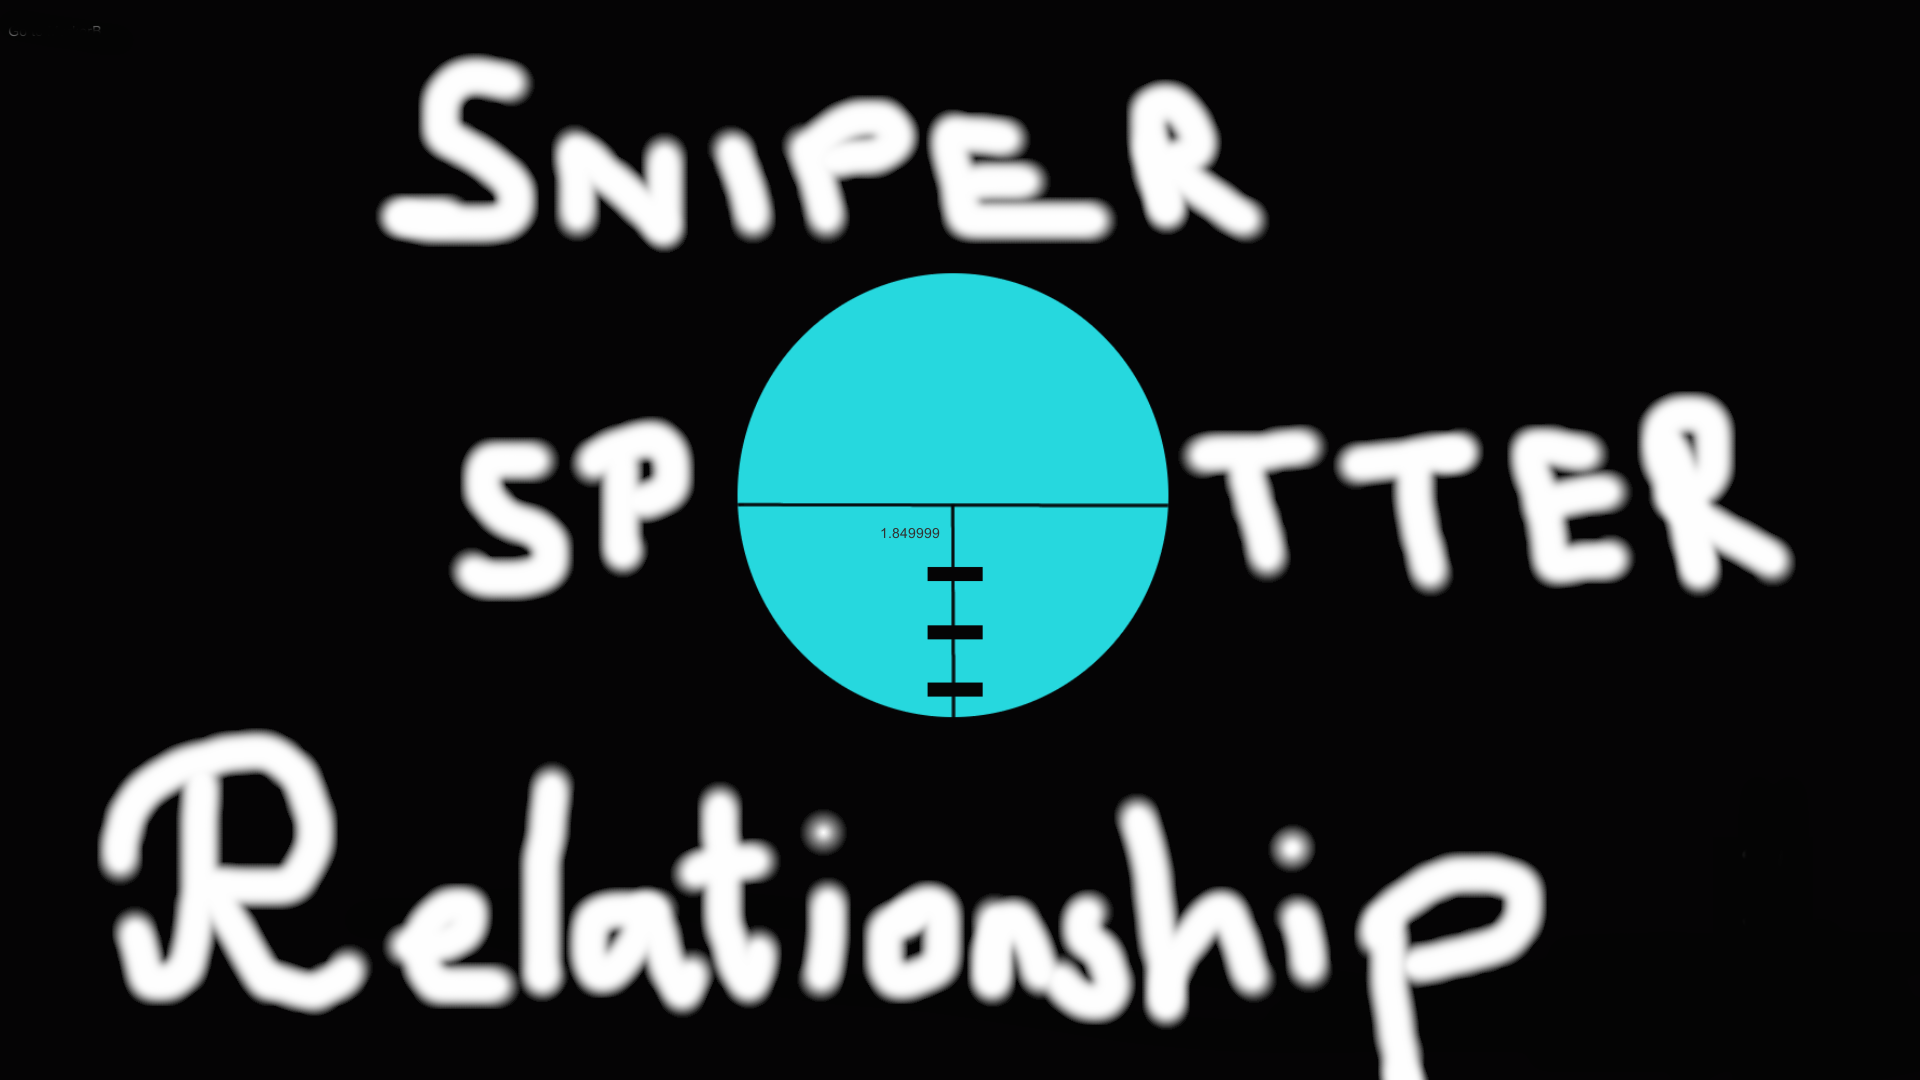 Sniper Spotter Relationship